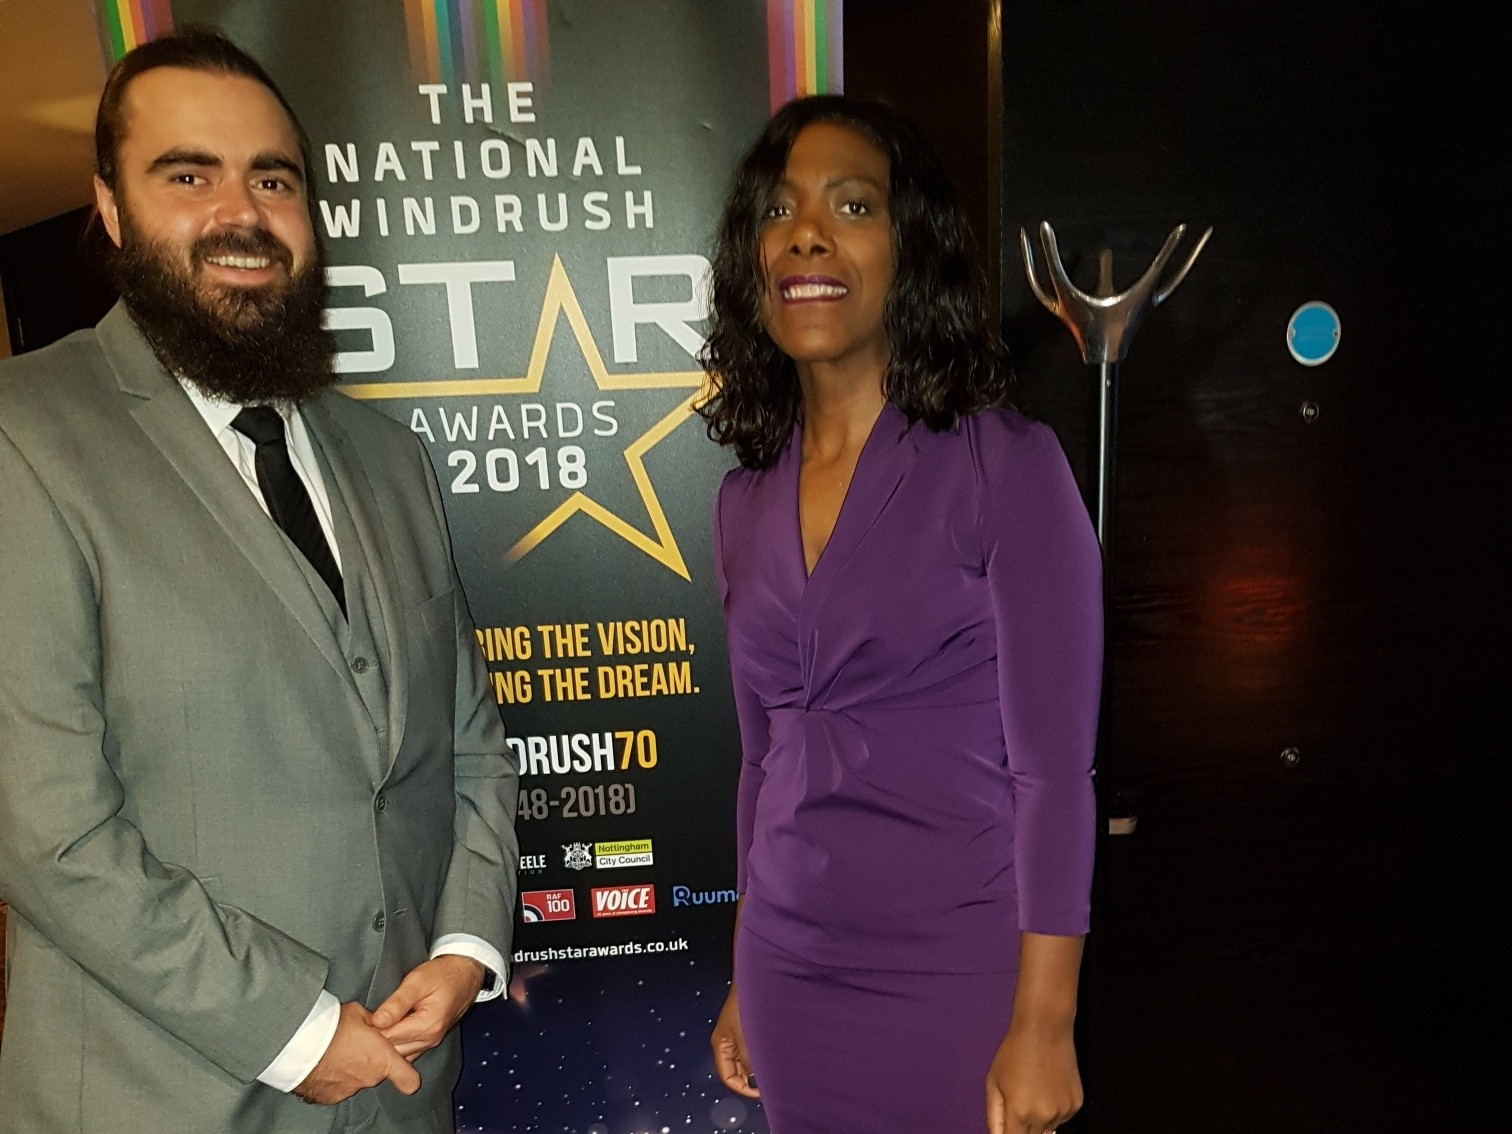 Andy and Carol, Service Coordinators at the National Windrush Awards